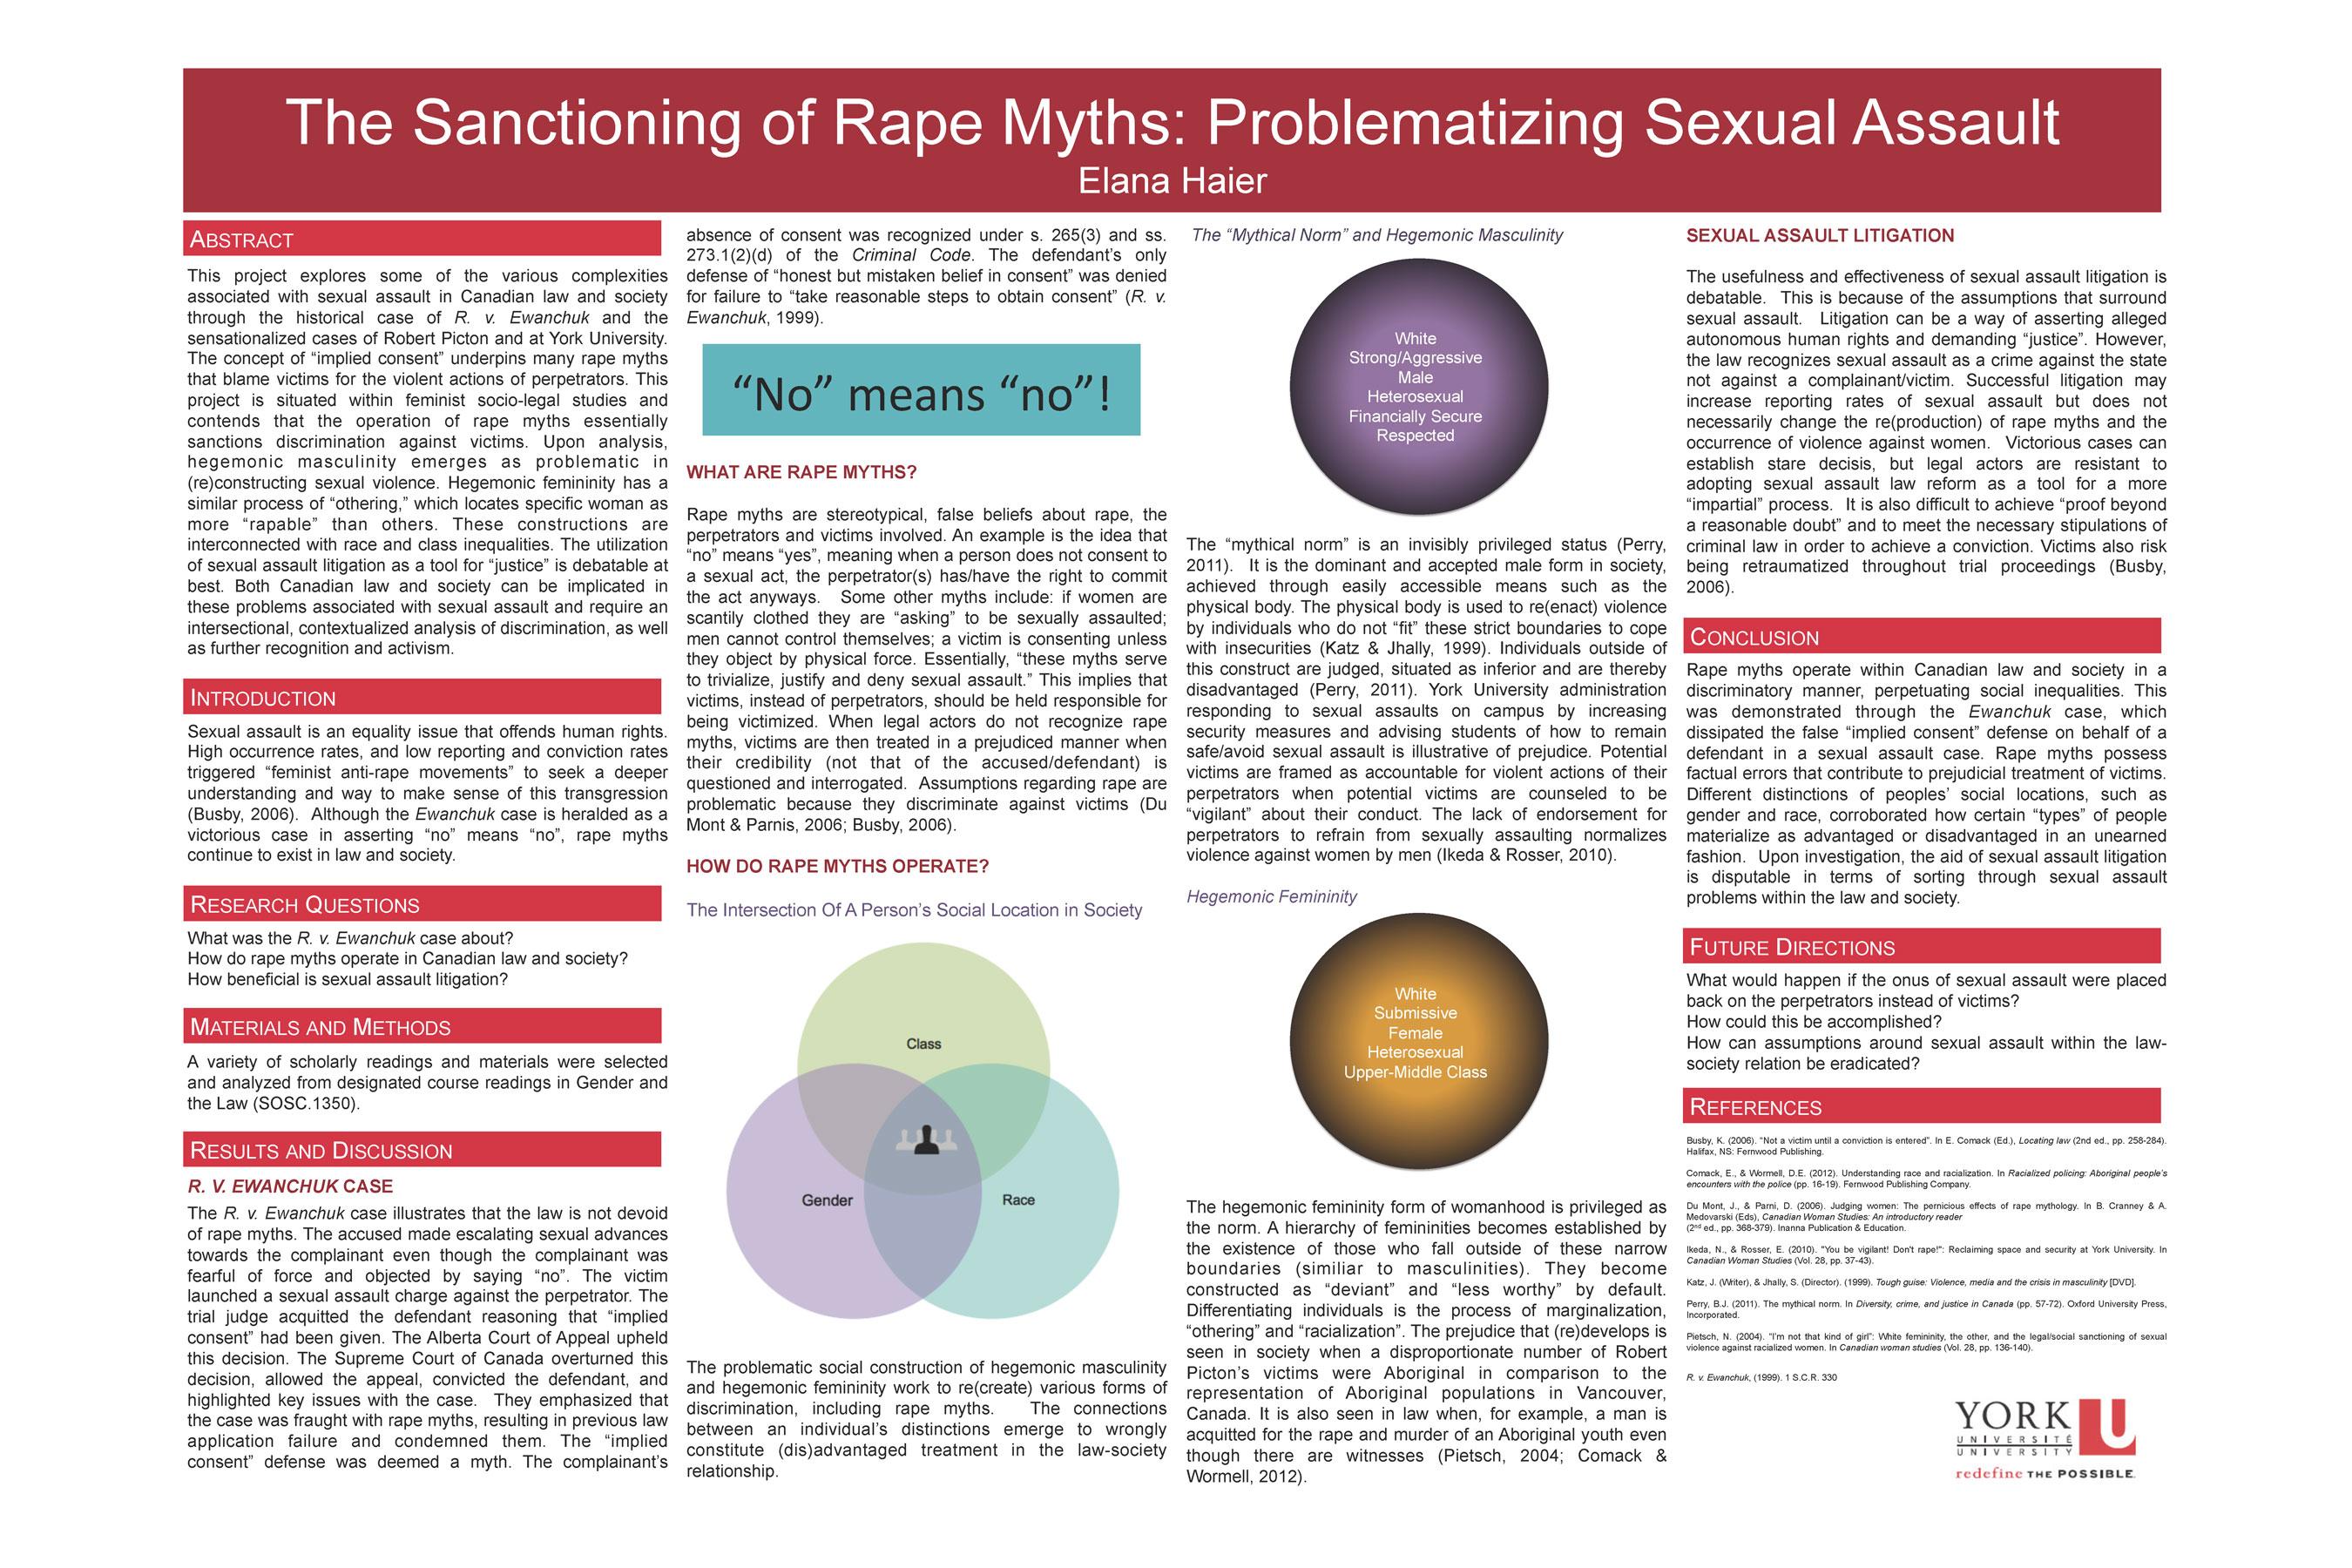 Elana Haier research poster